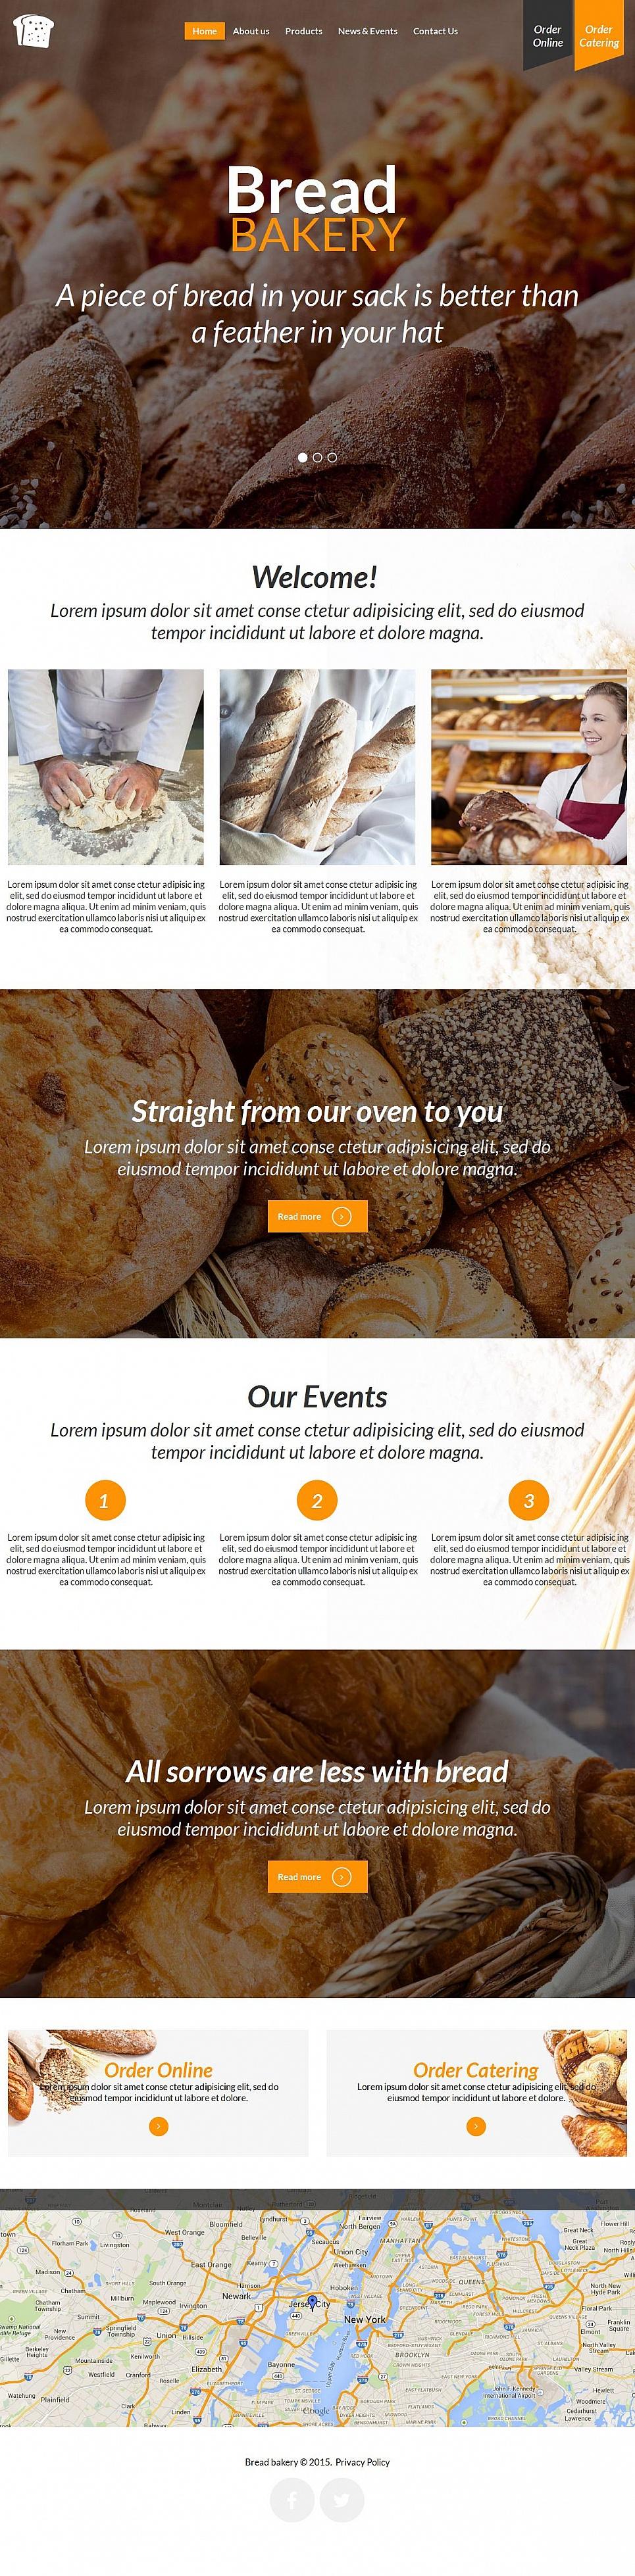 Bread Bakery Website Theme - image